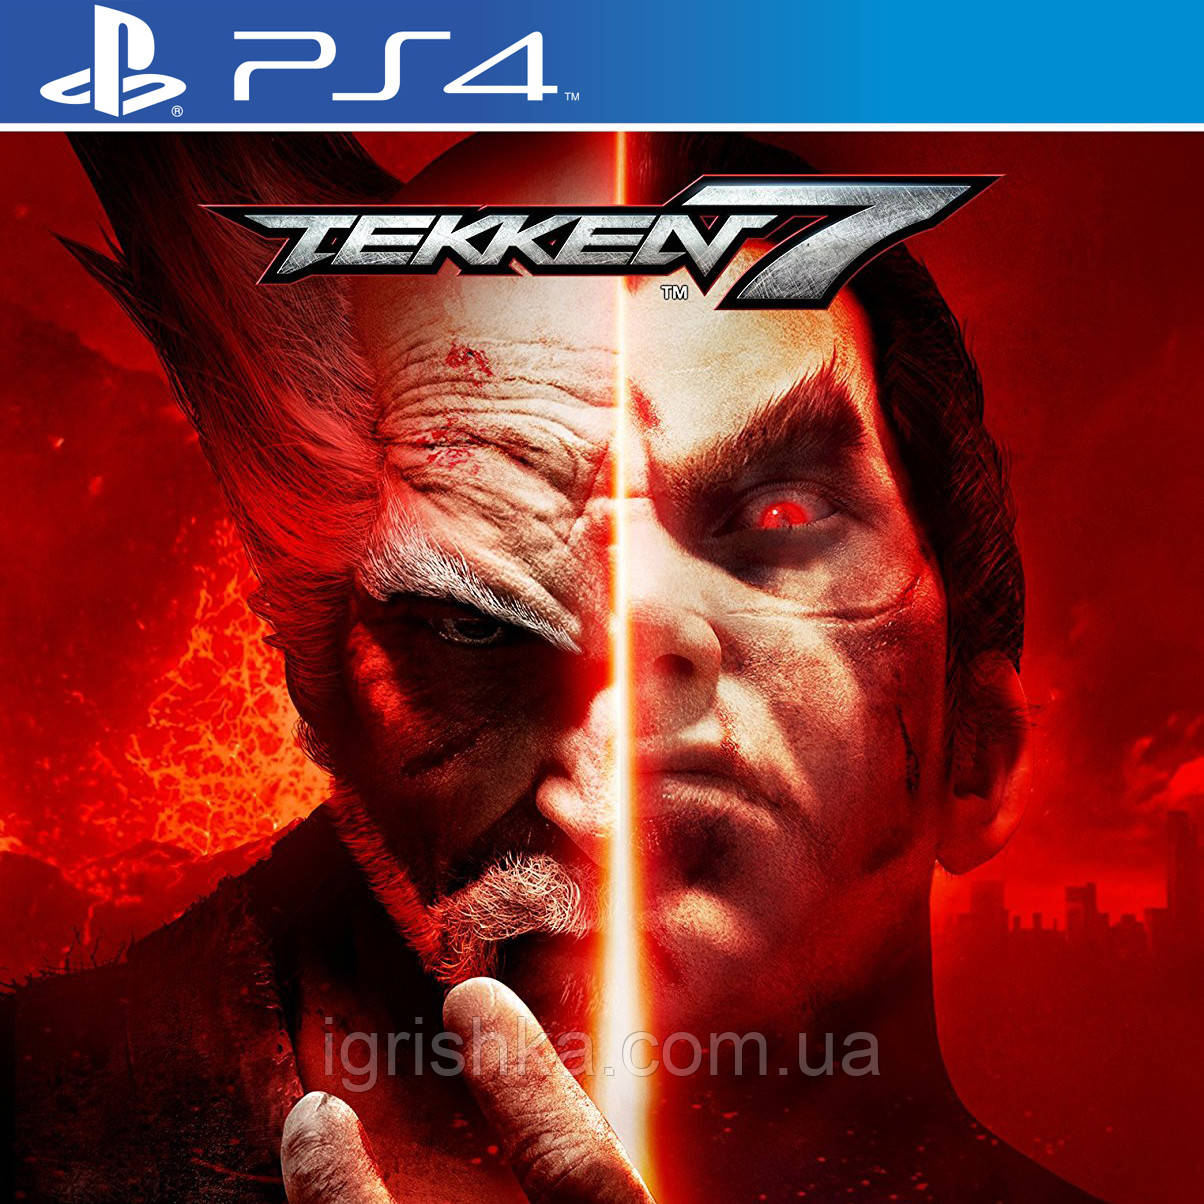 TEKKEN 7 Ps4 (Цифровой аккаунт для PlayStation 4) П3